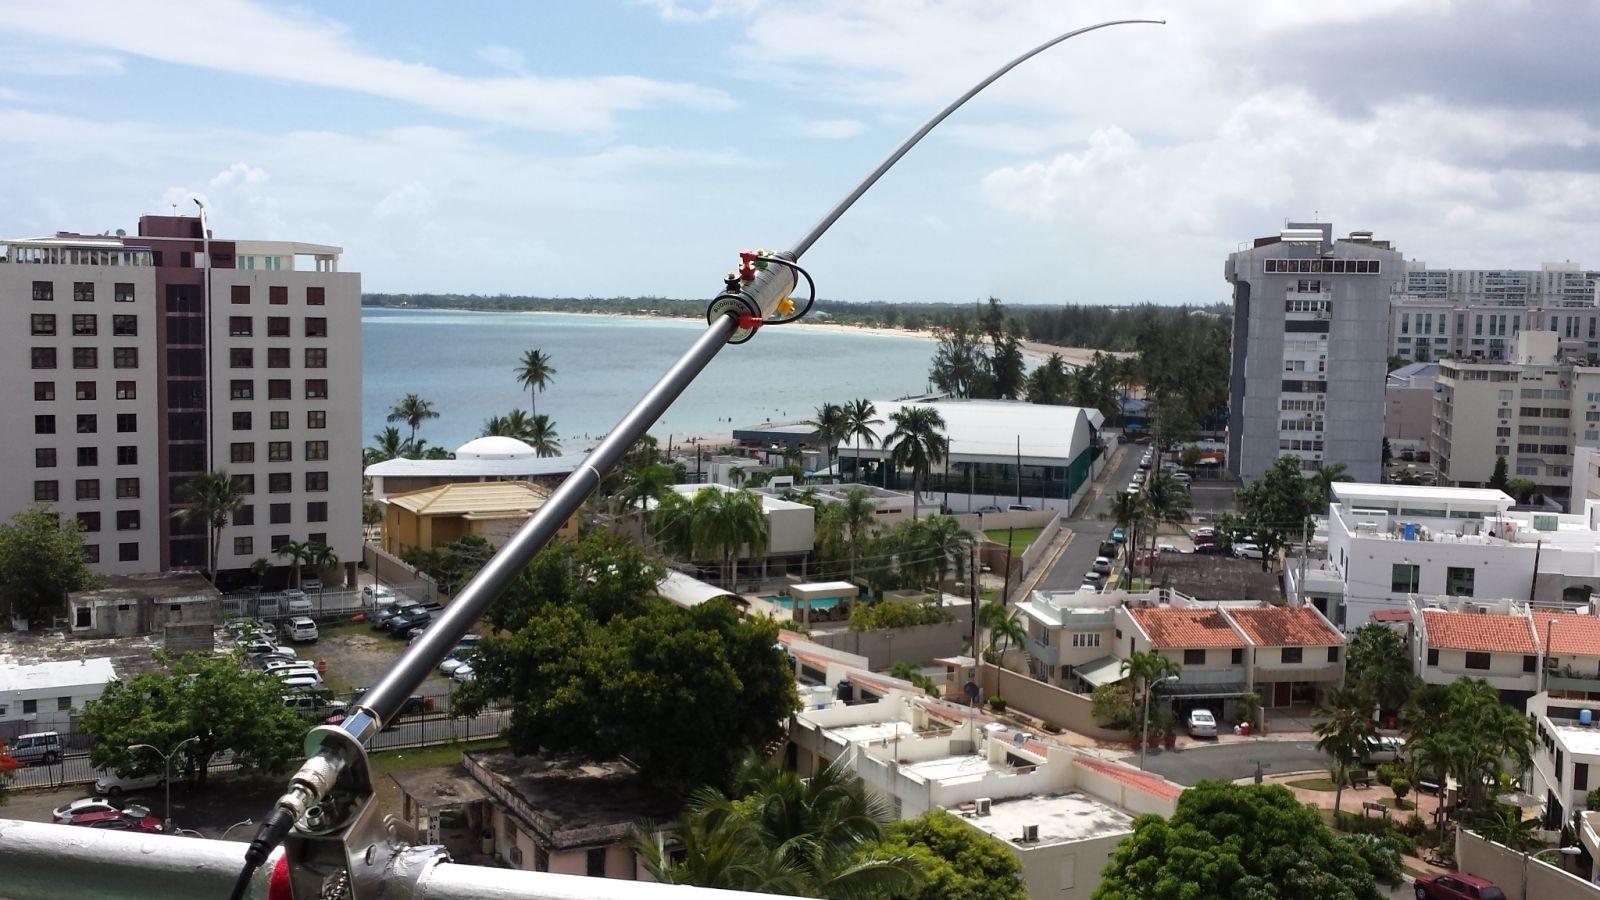 Balcony mounted Buddistick monopole antenna.  View northeast toward the Atlantic Ocean and Europe.